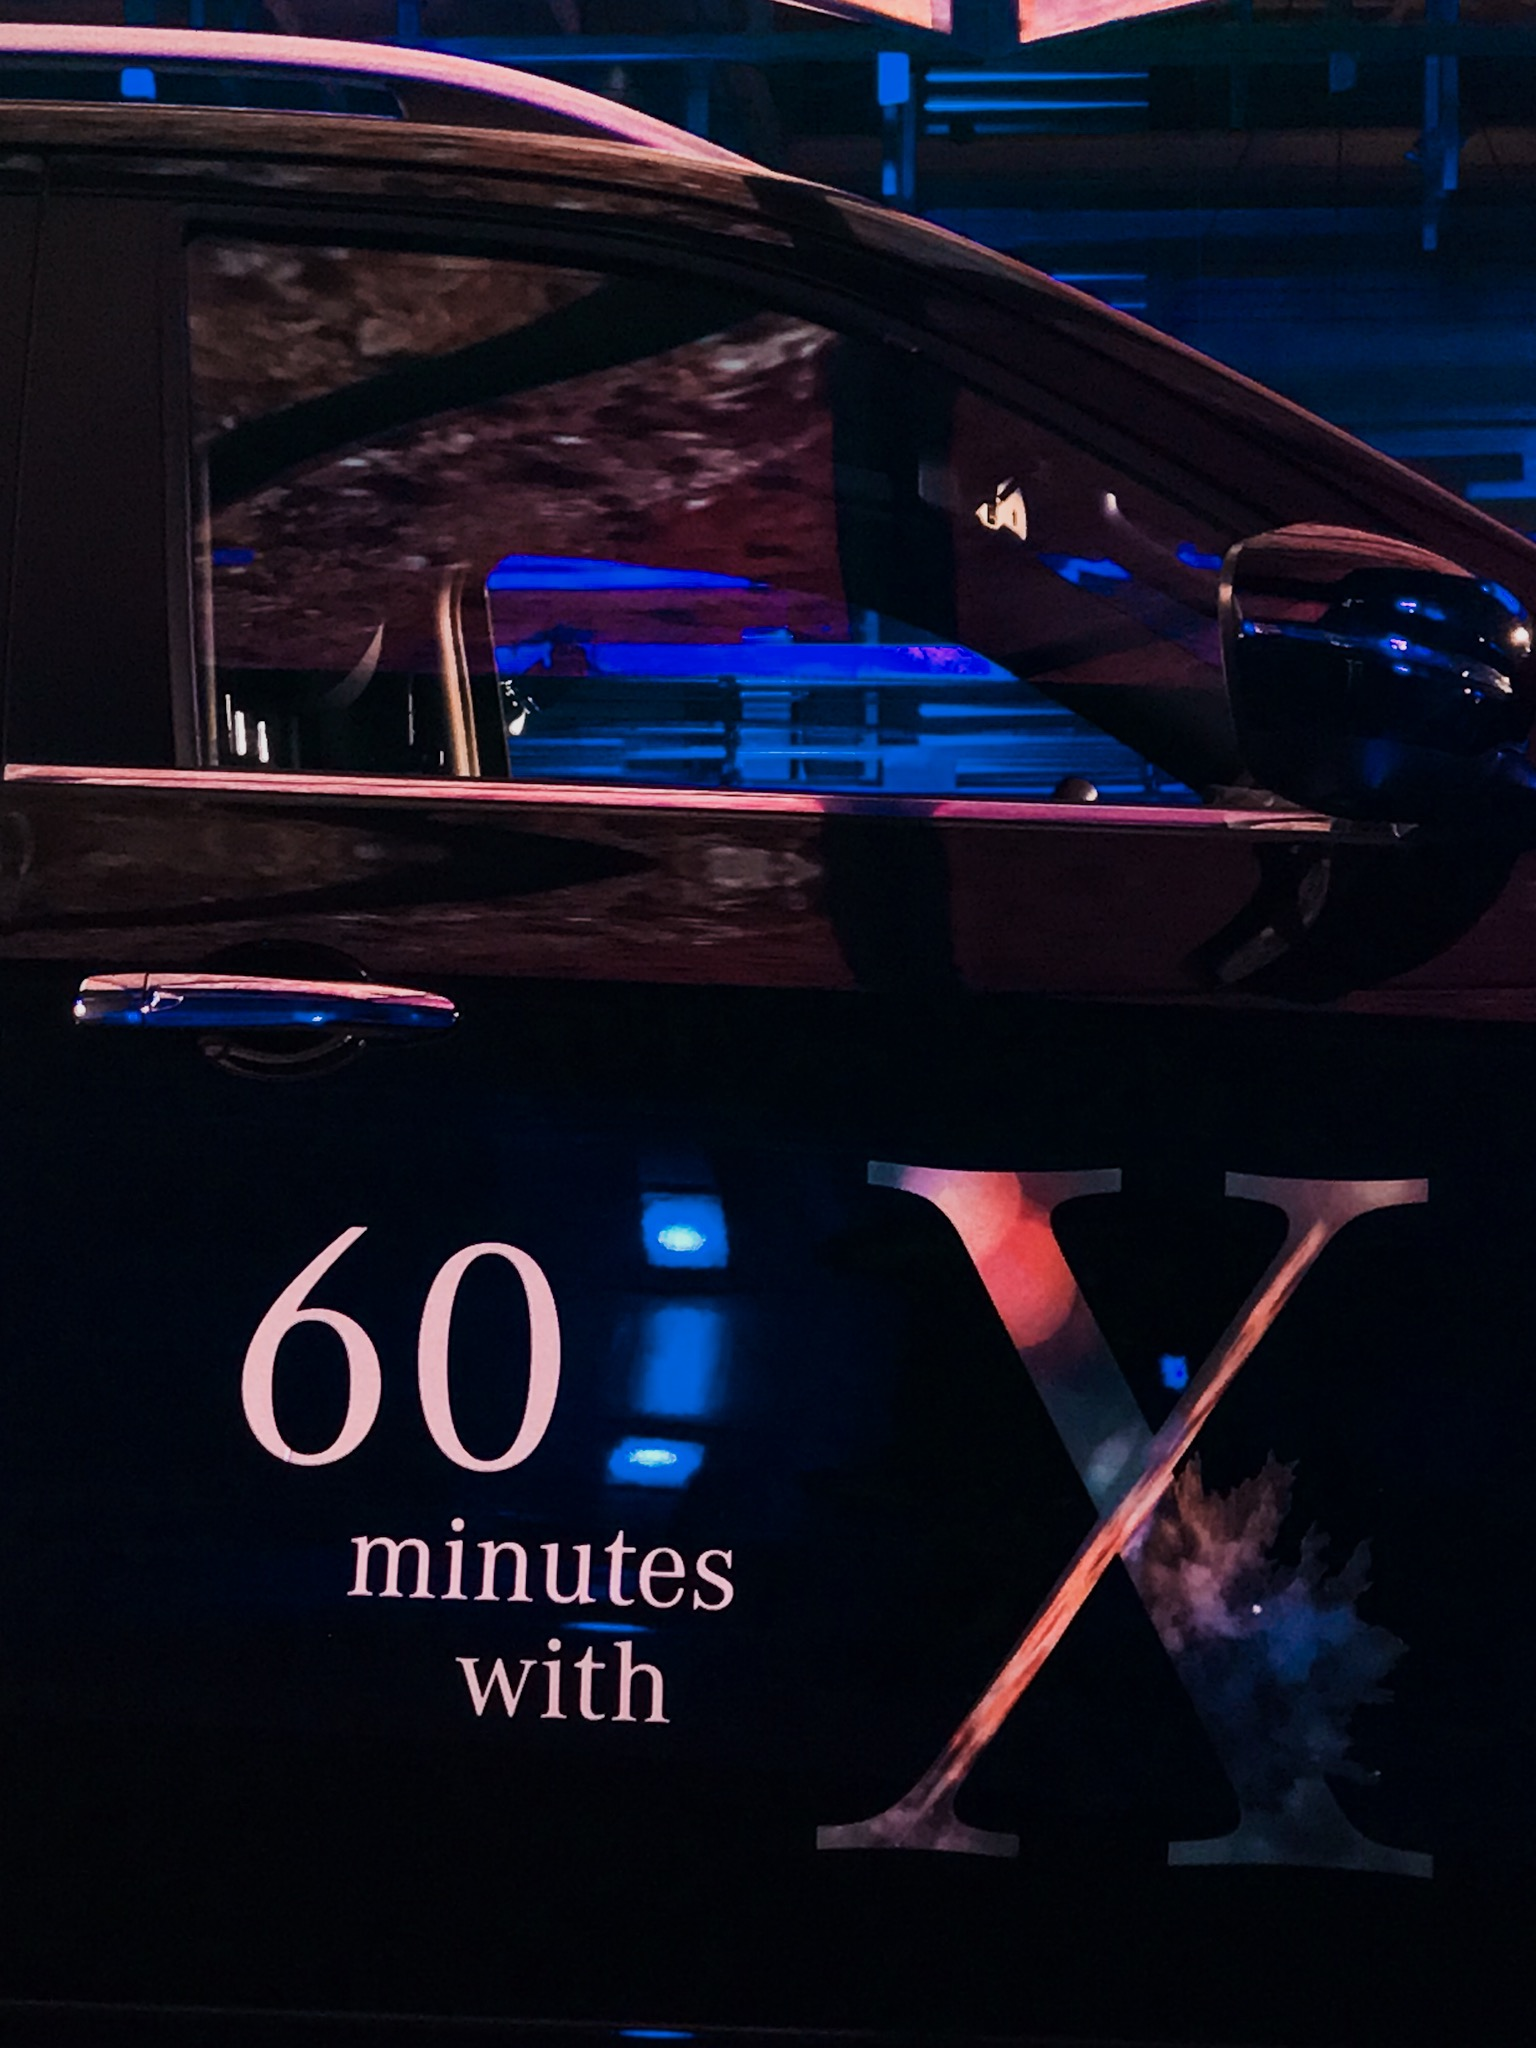 #60minuteswithX